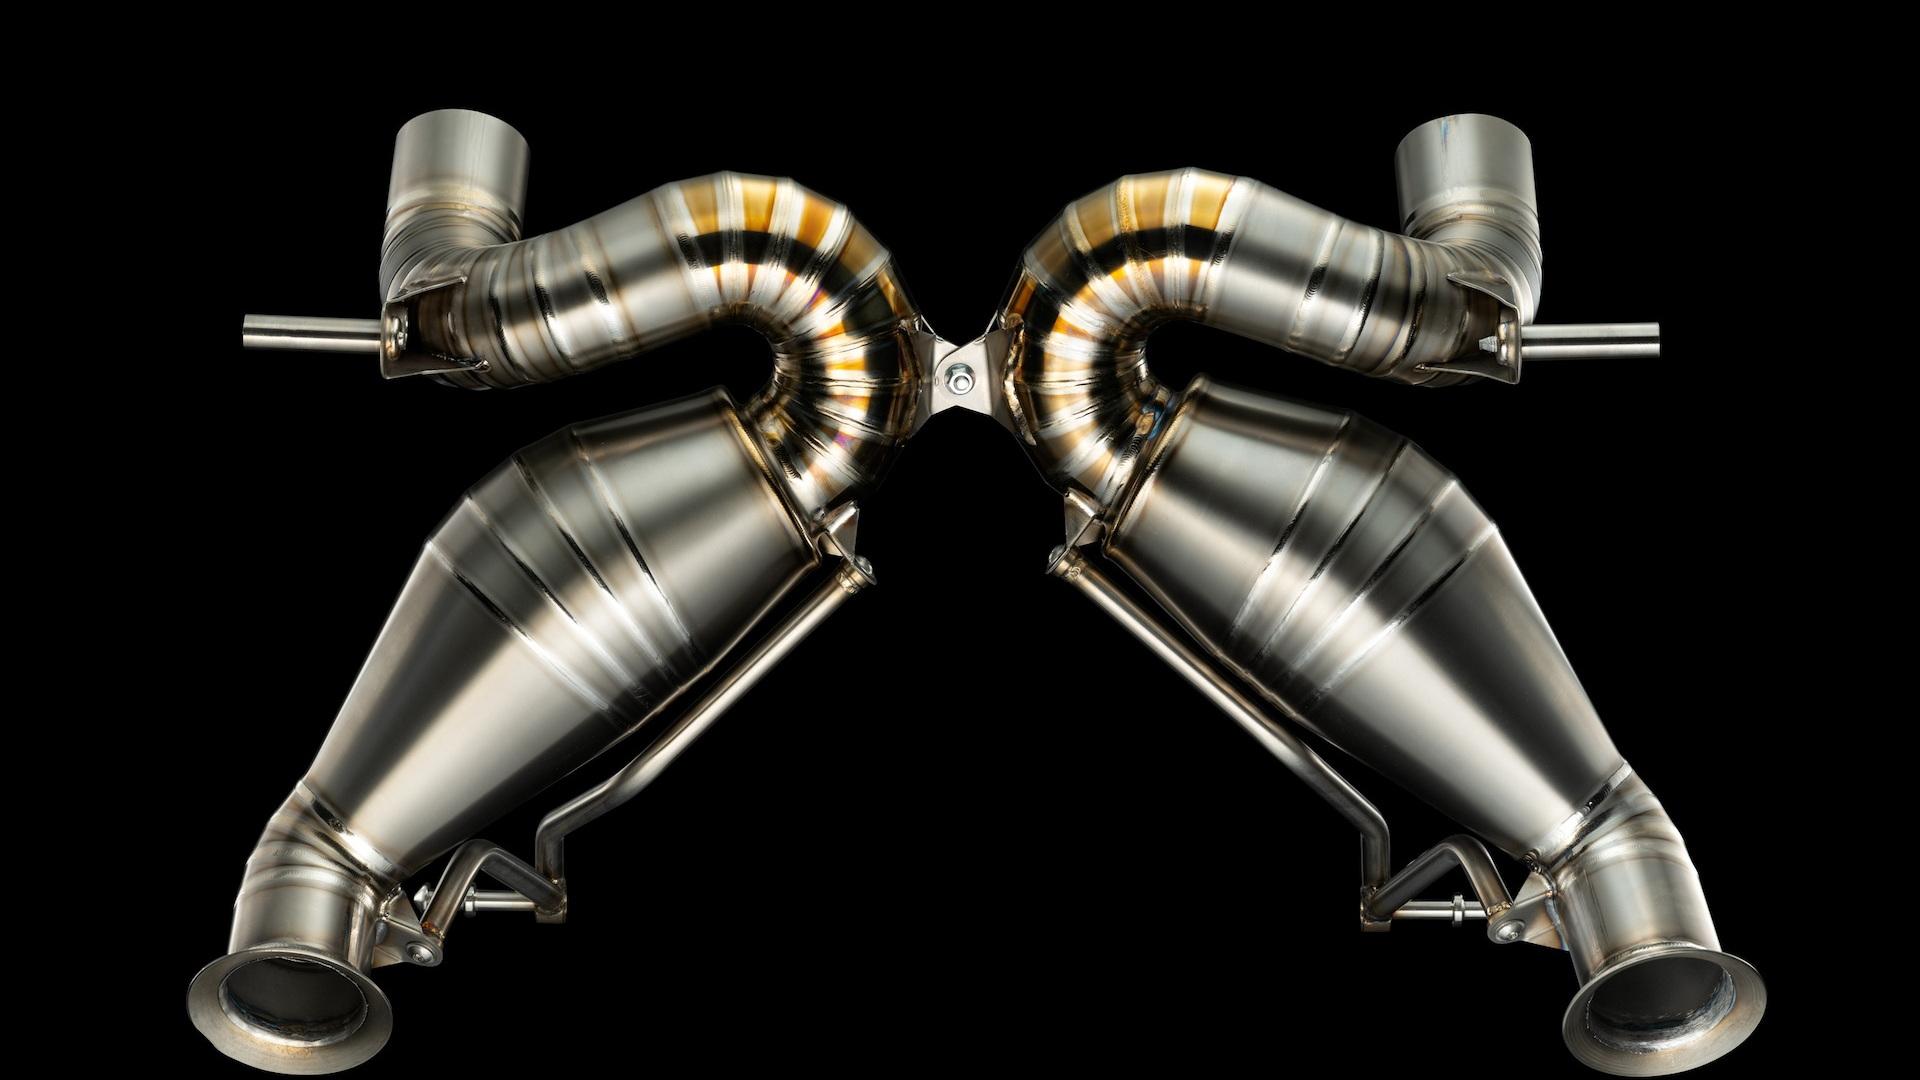 Valentino Balboni exhaust for Lamborghini Aventador SVJ